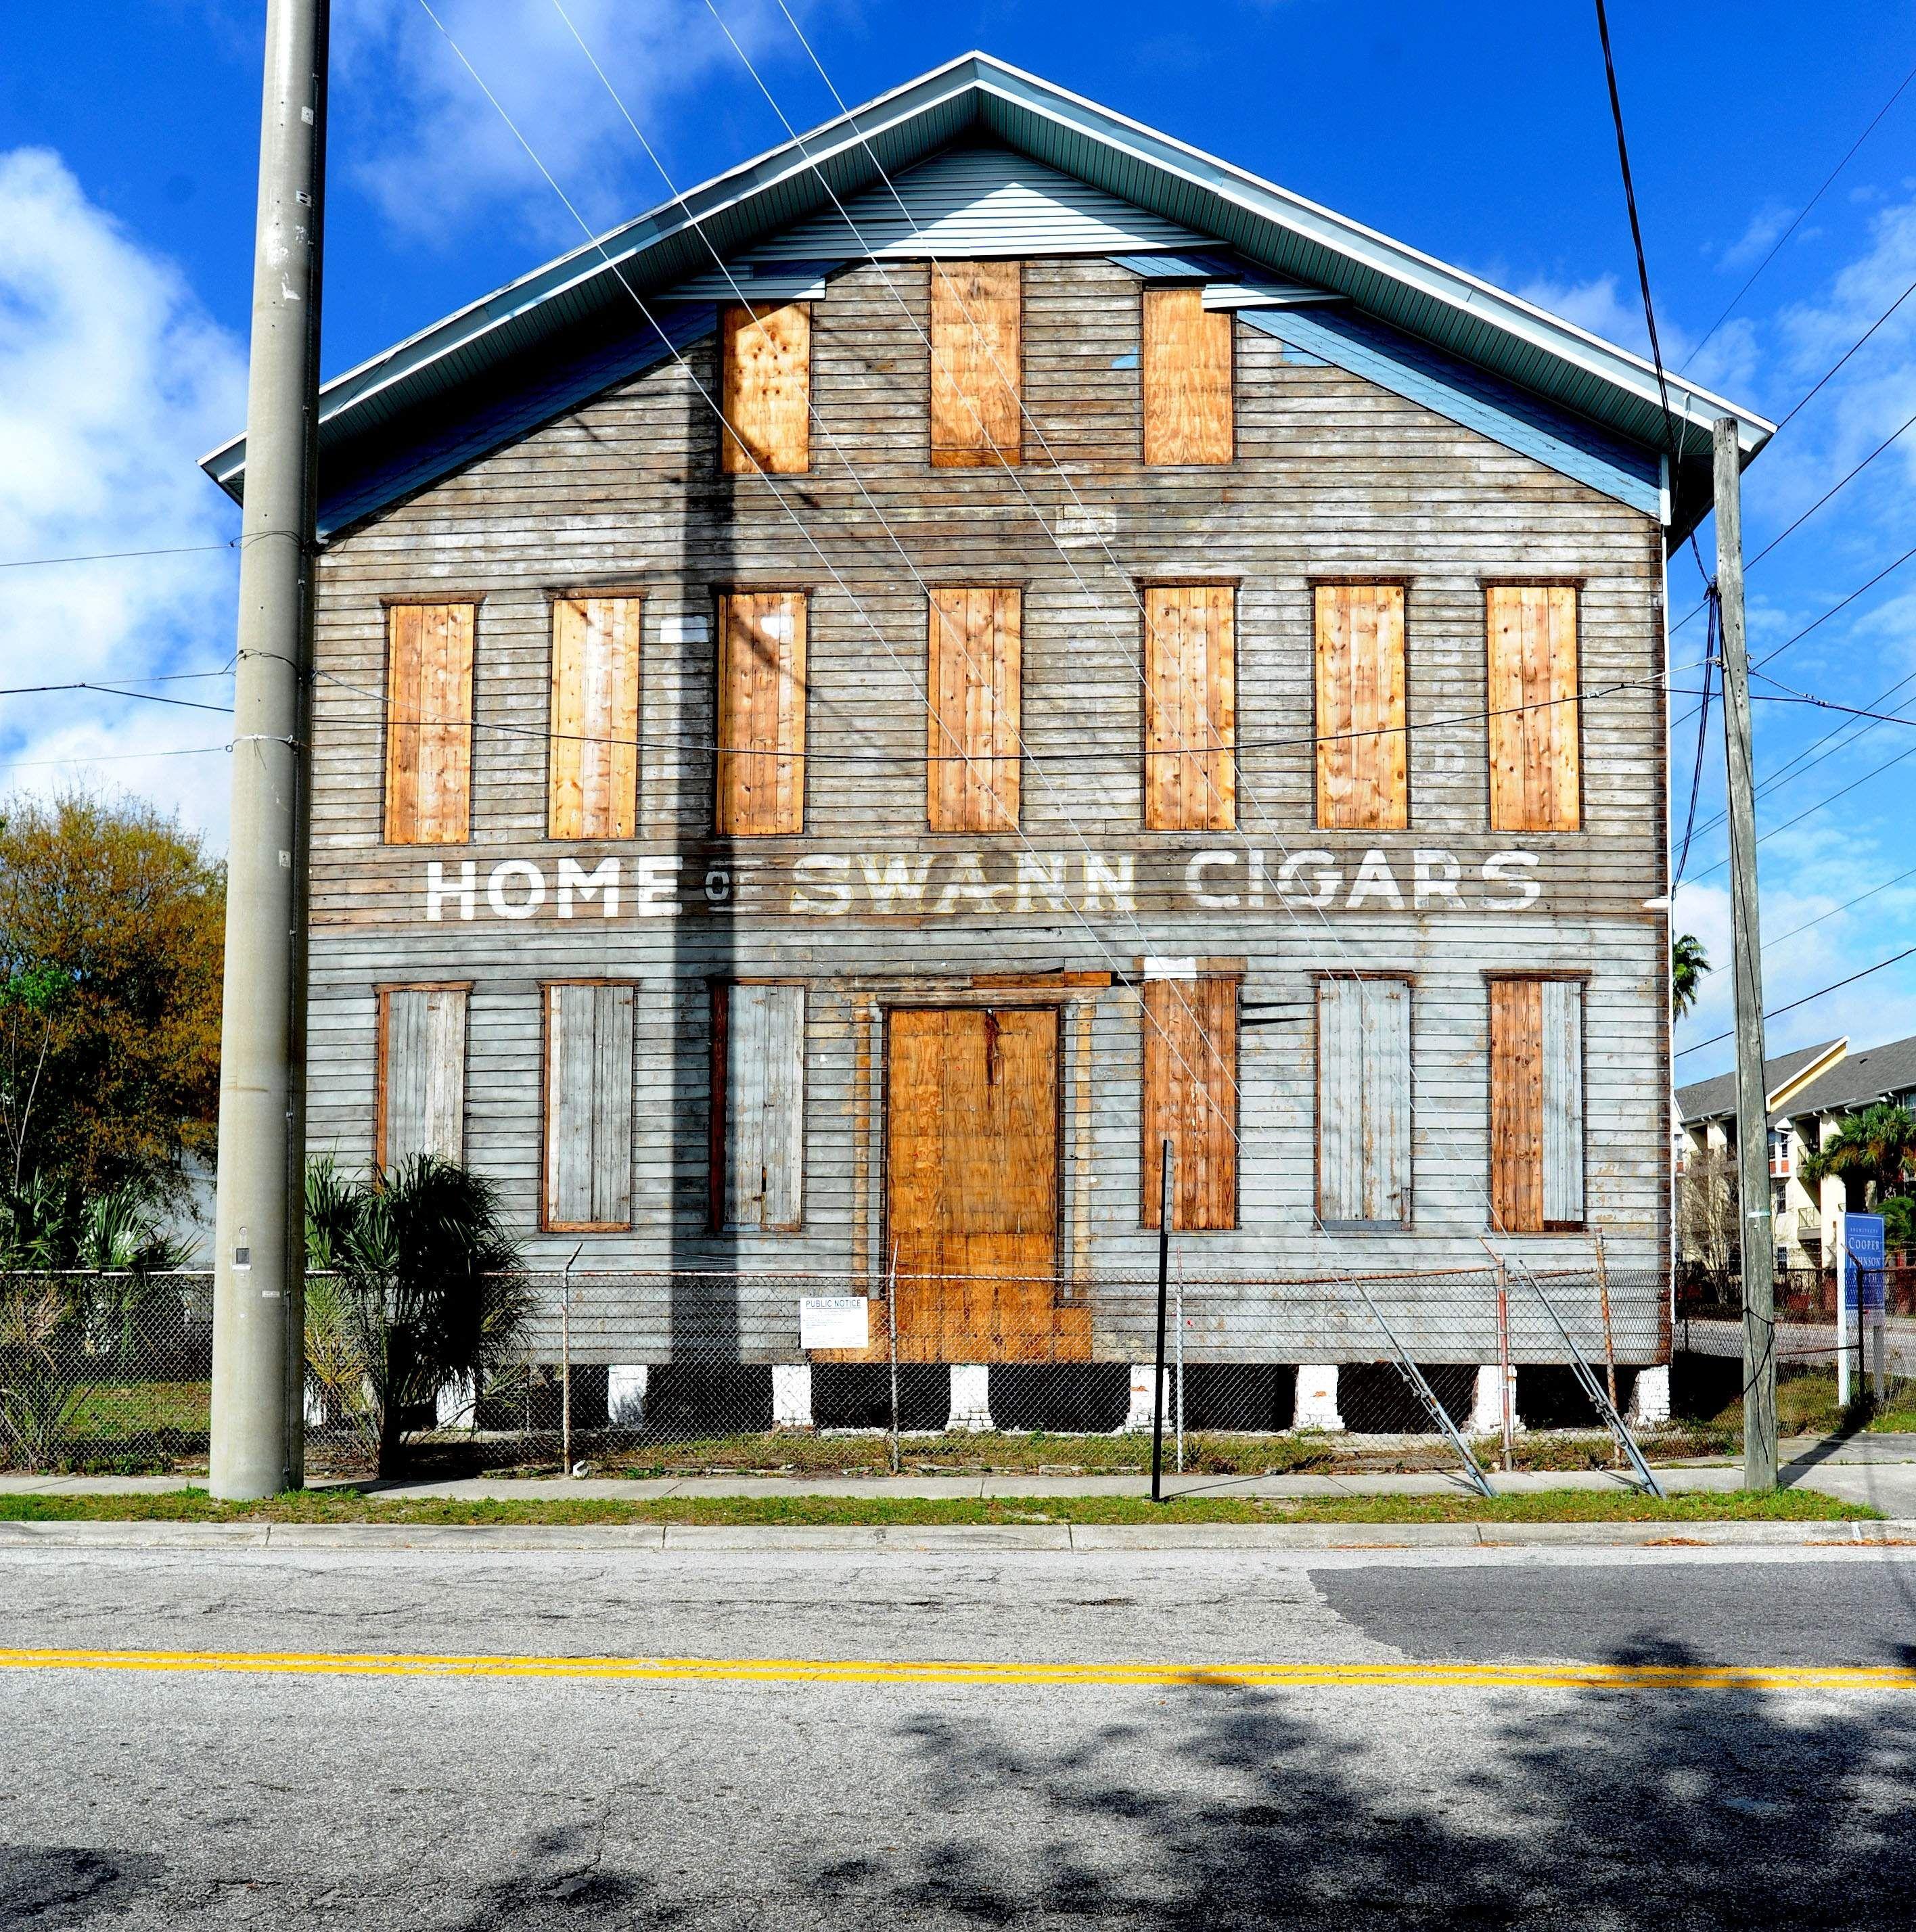 fcbfe02d02c8f5a0a840c431ae157d99 - Brighton Gardens Of Tampa Tampa Fl